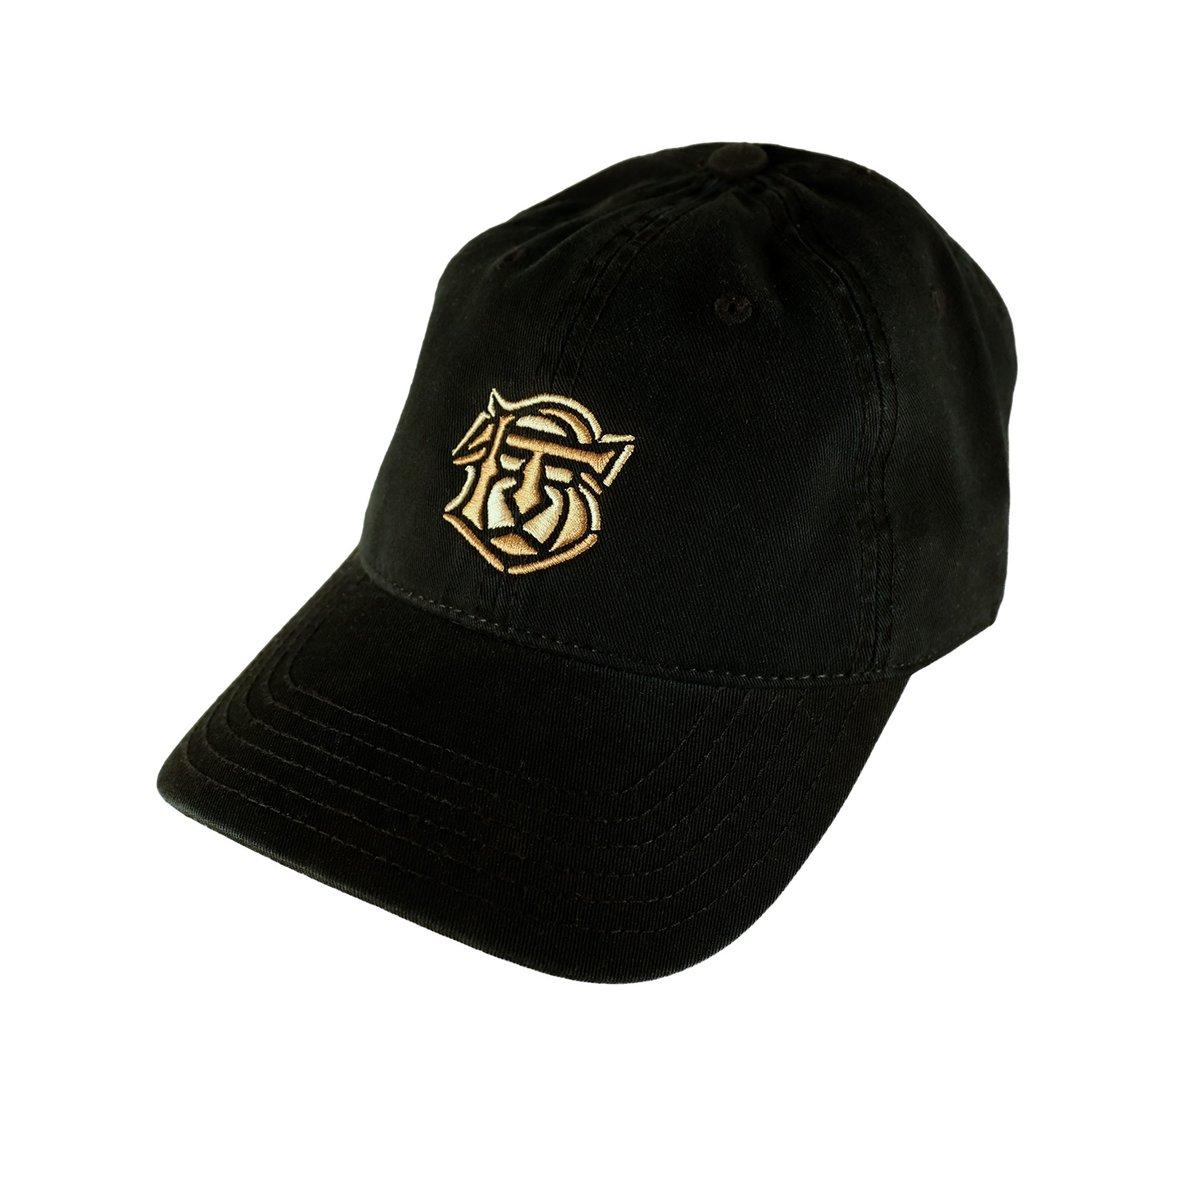 Image of All Black Dad Hat